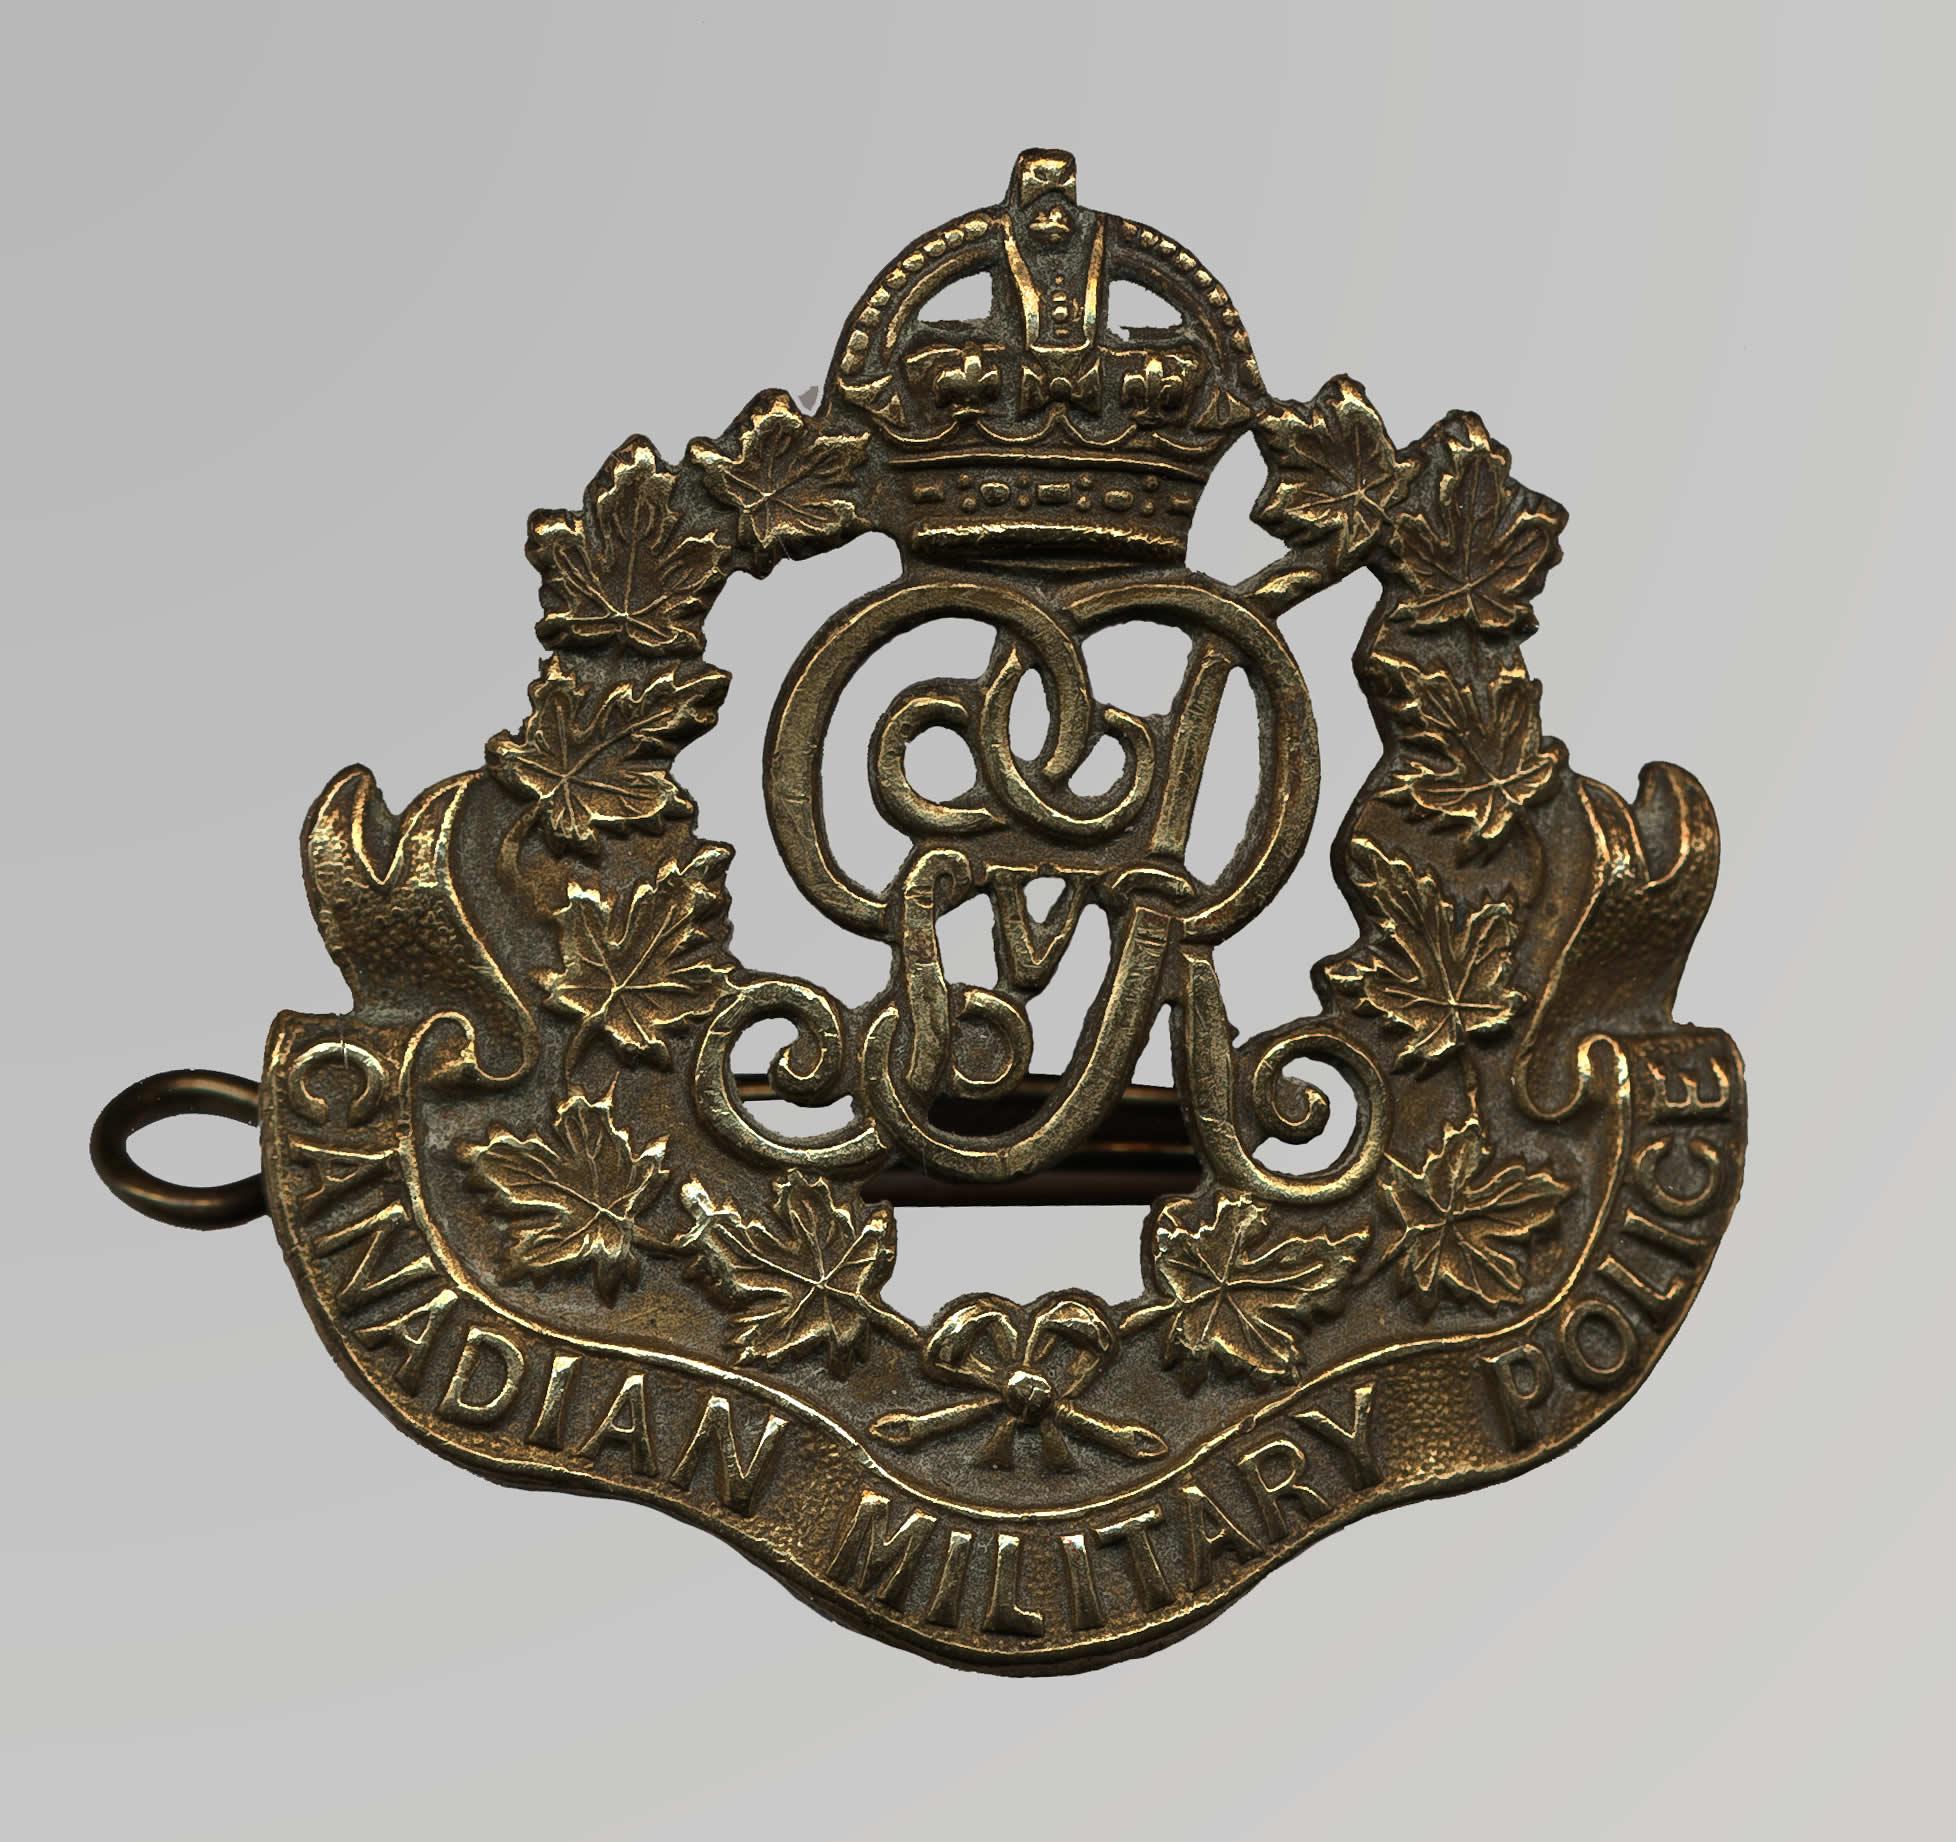 Insigne de casquette de la police militaire